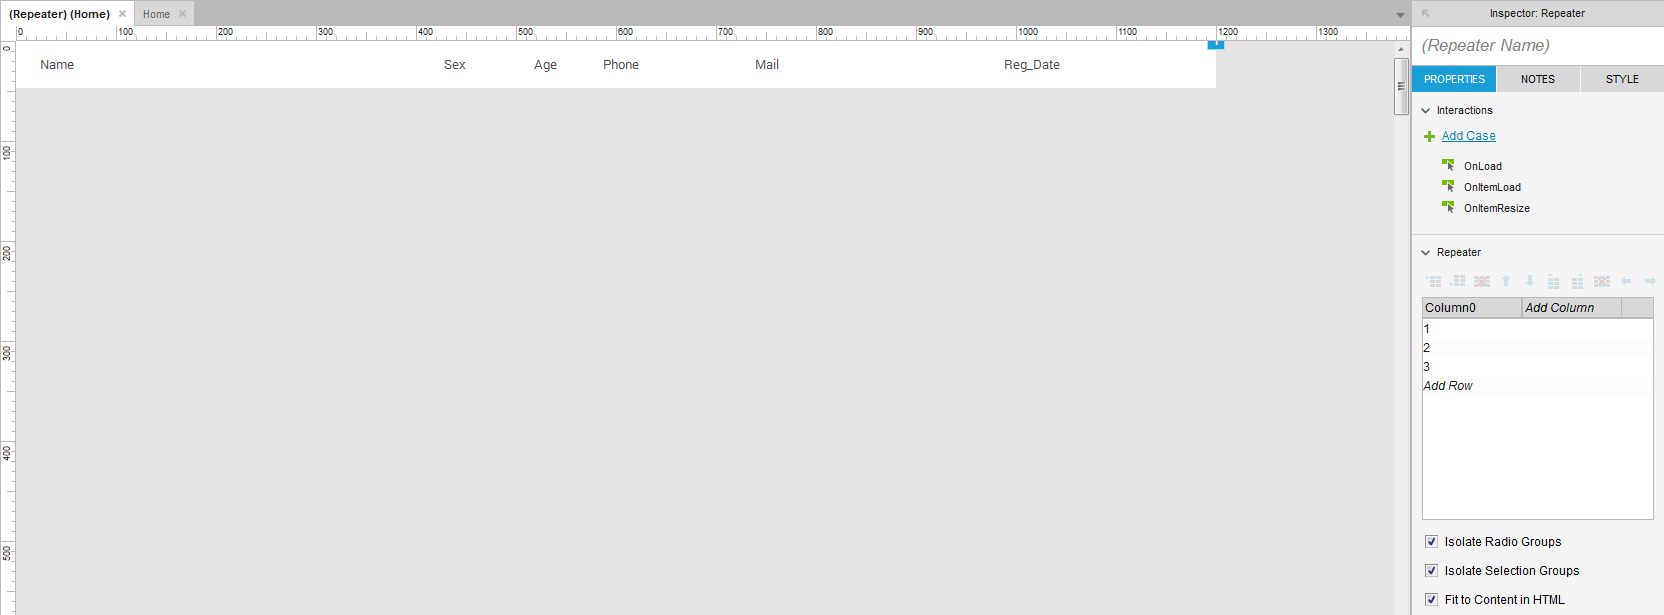 Прототипируем таблицу в Axure - 3